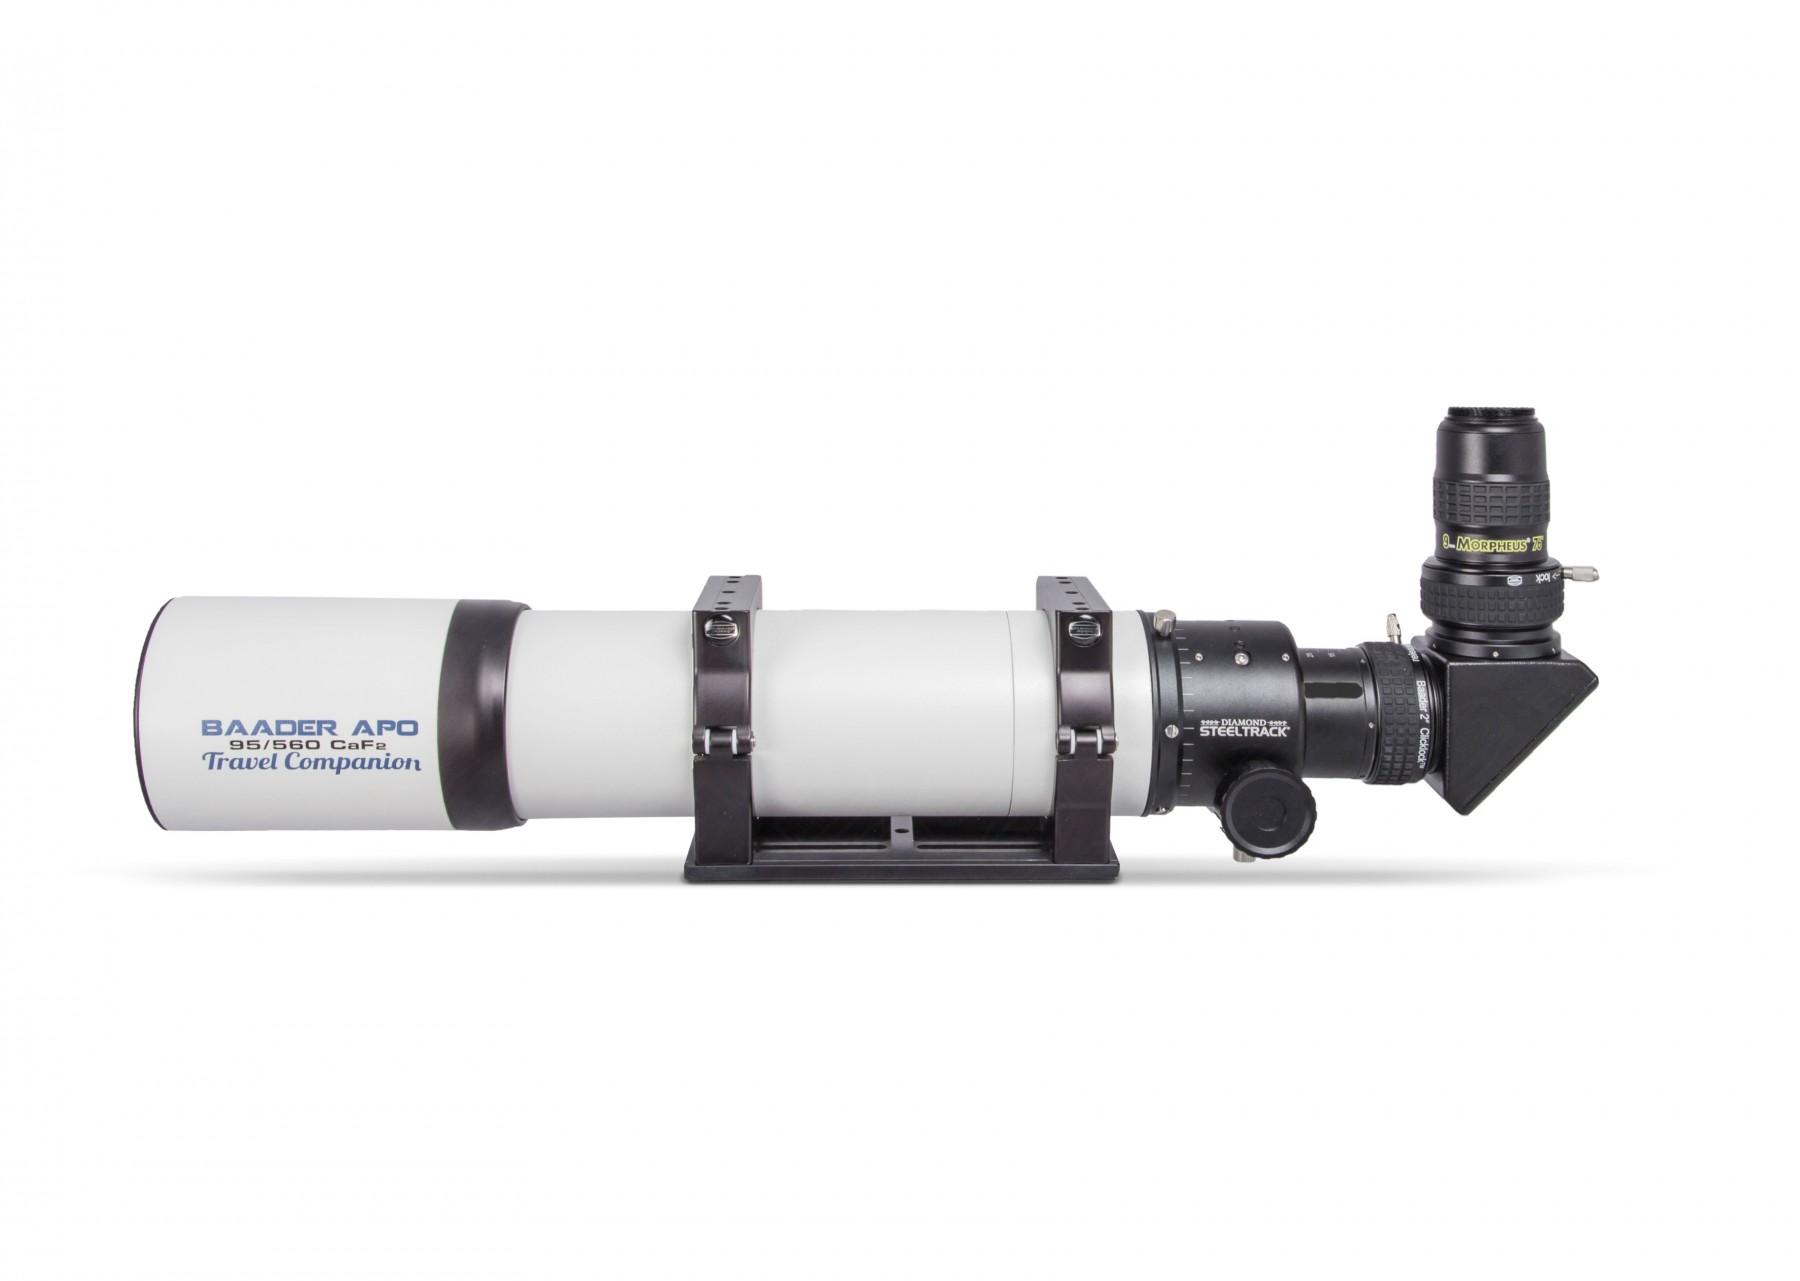 Application image: Baader Fluorit APO (inkl. Diamond Steeltrack), Clicklock S58, BBHS Zenitspiegel, Morpheus 76°